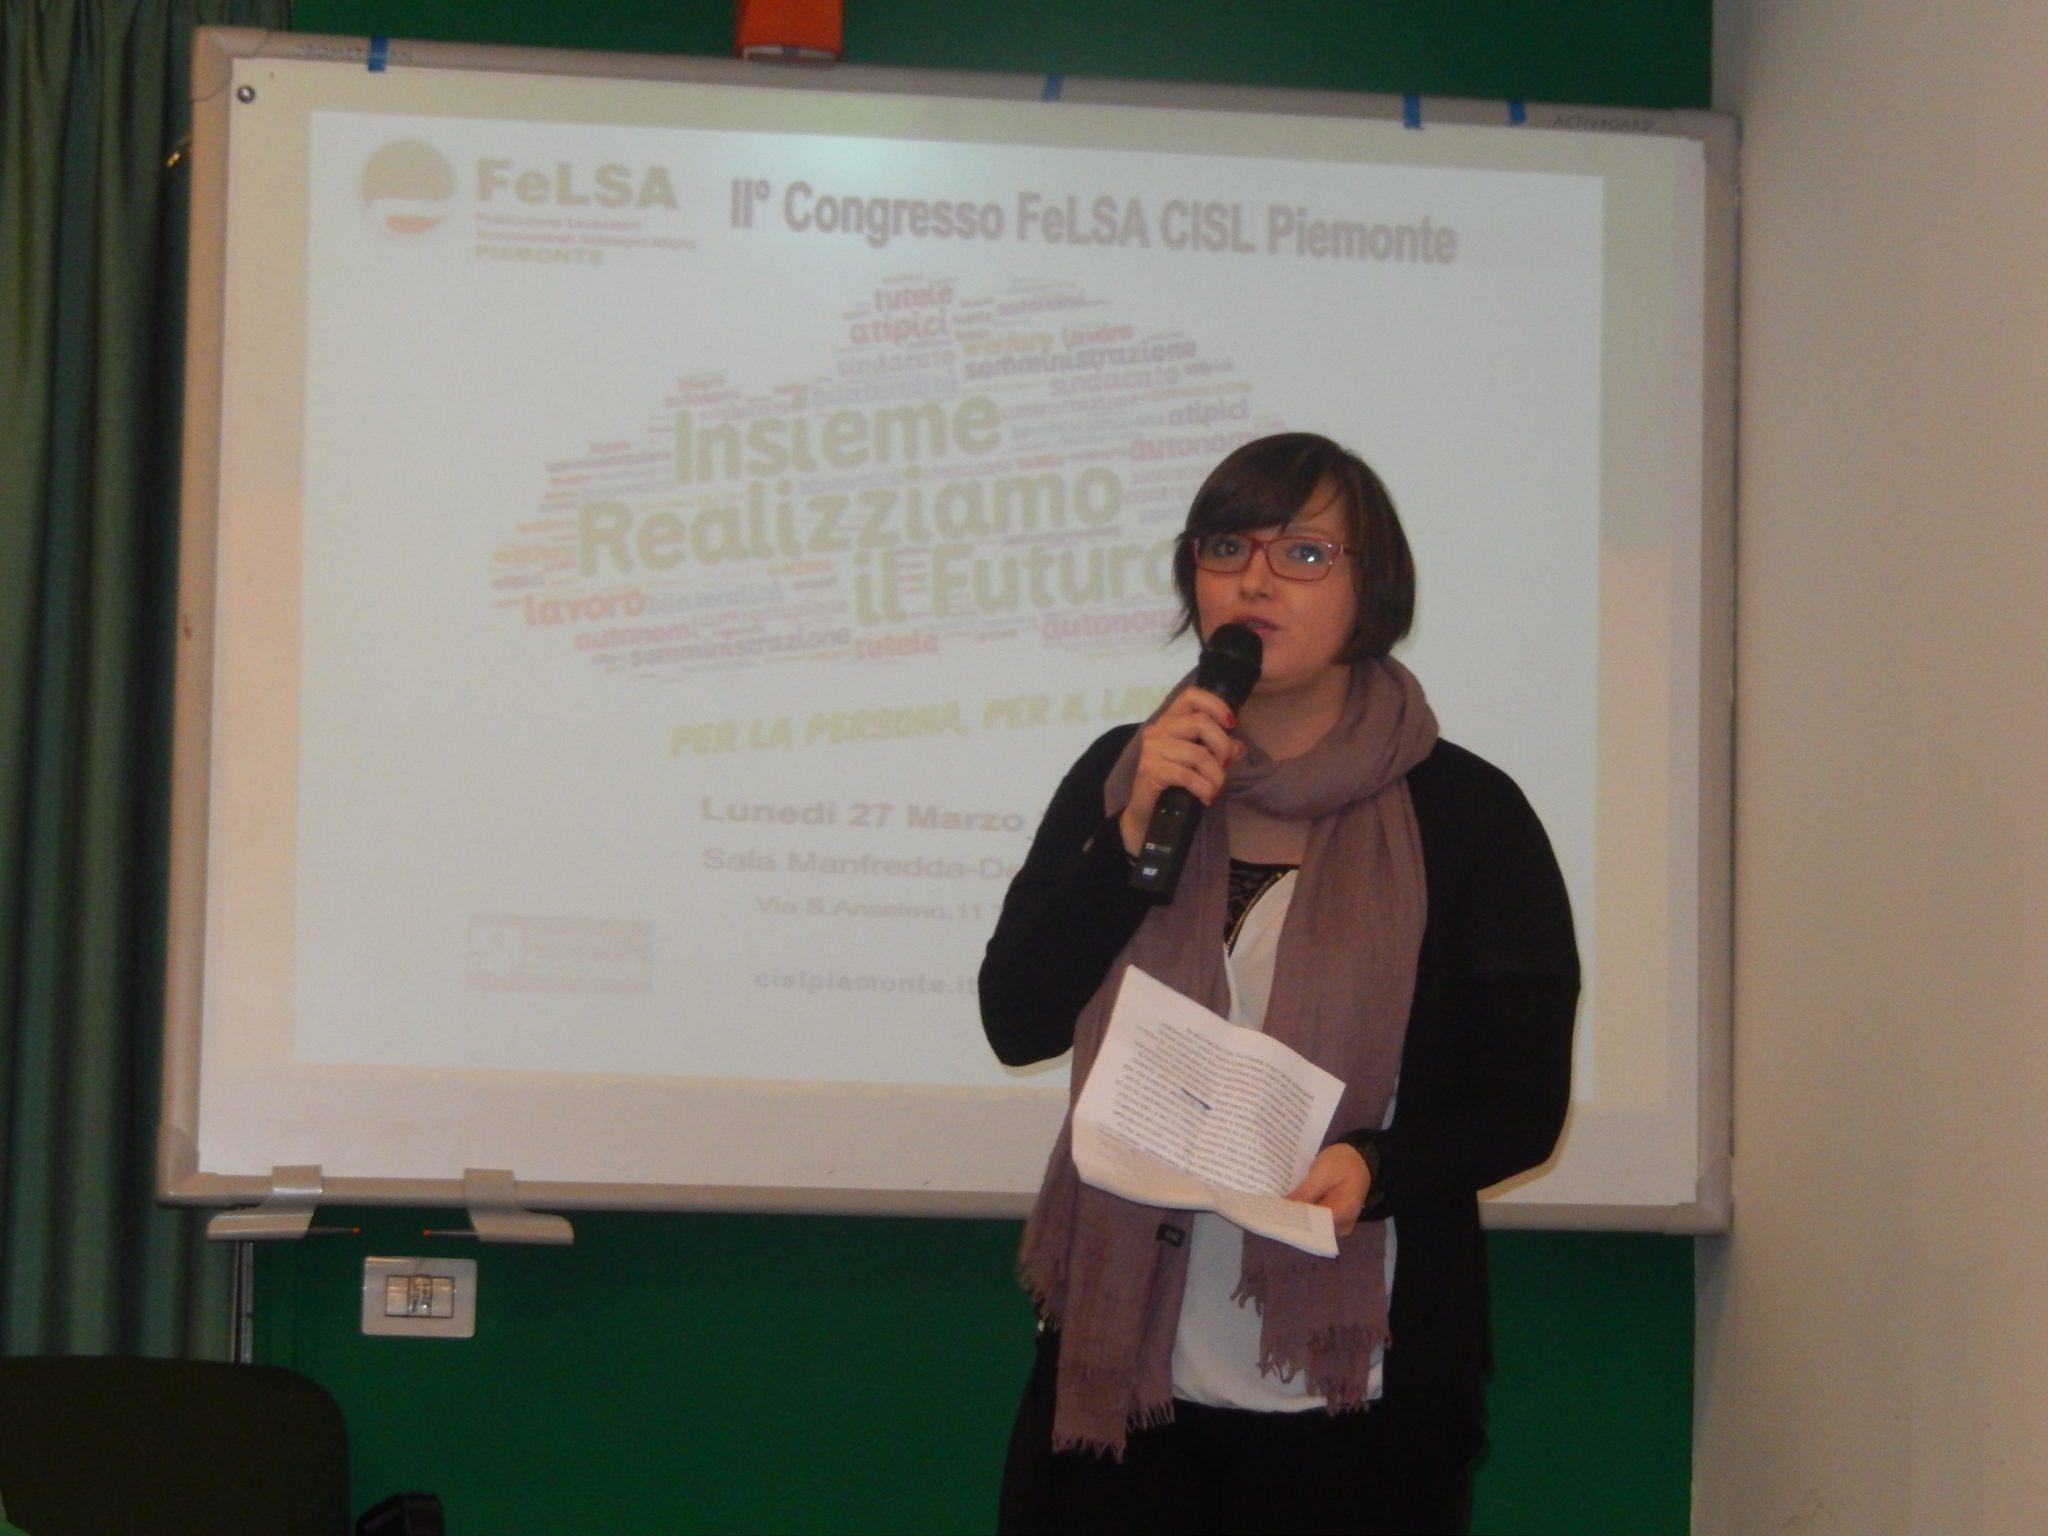 delegata Felsa Piemonte